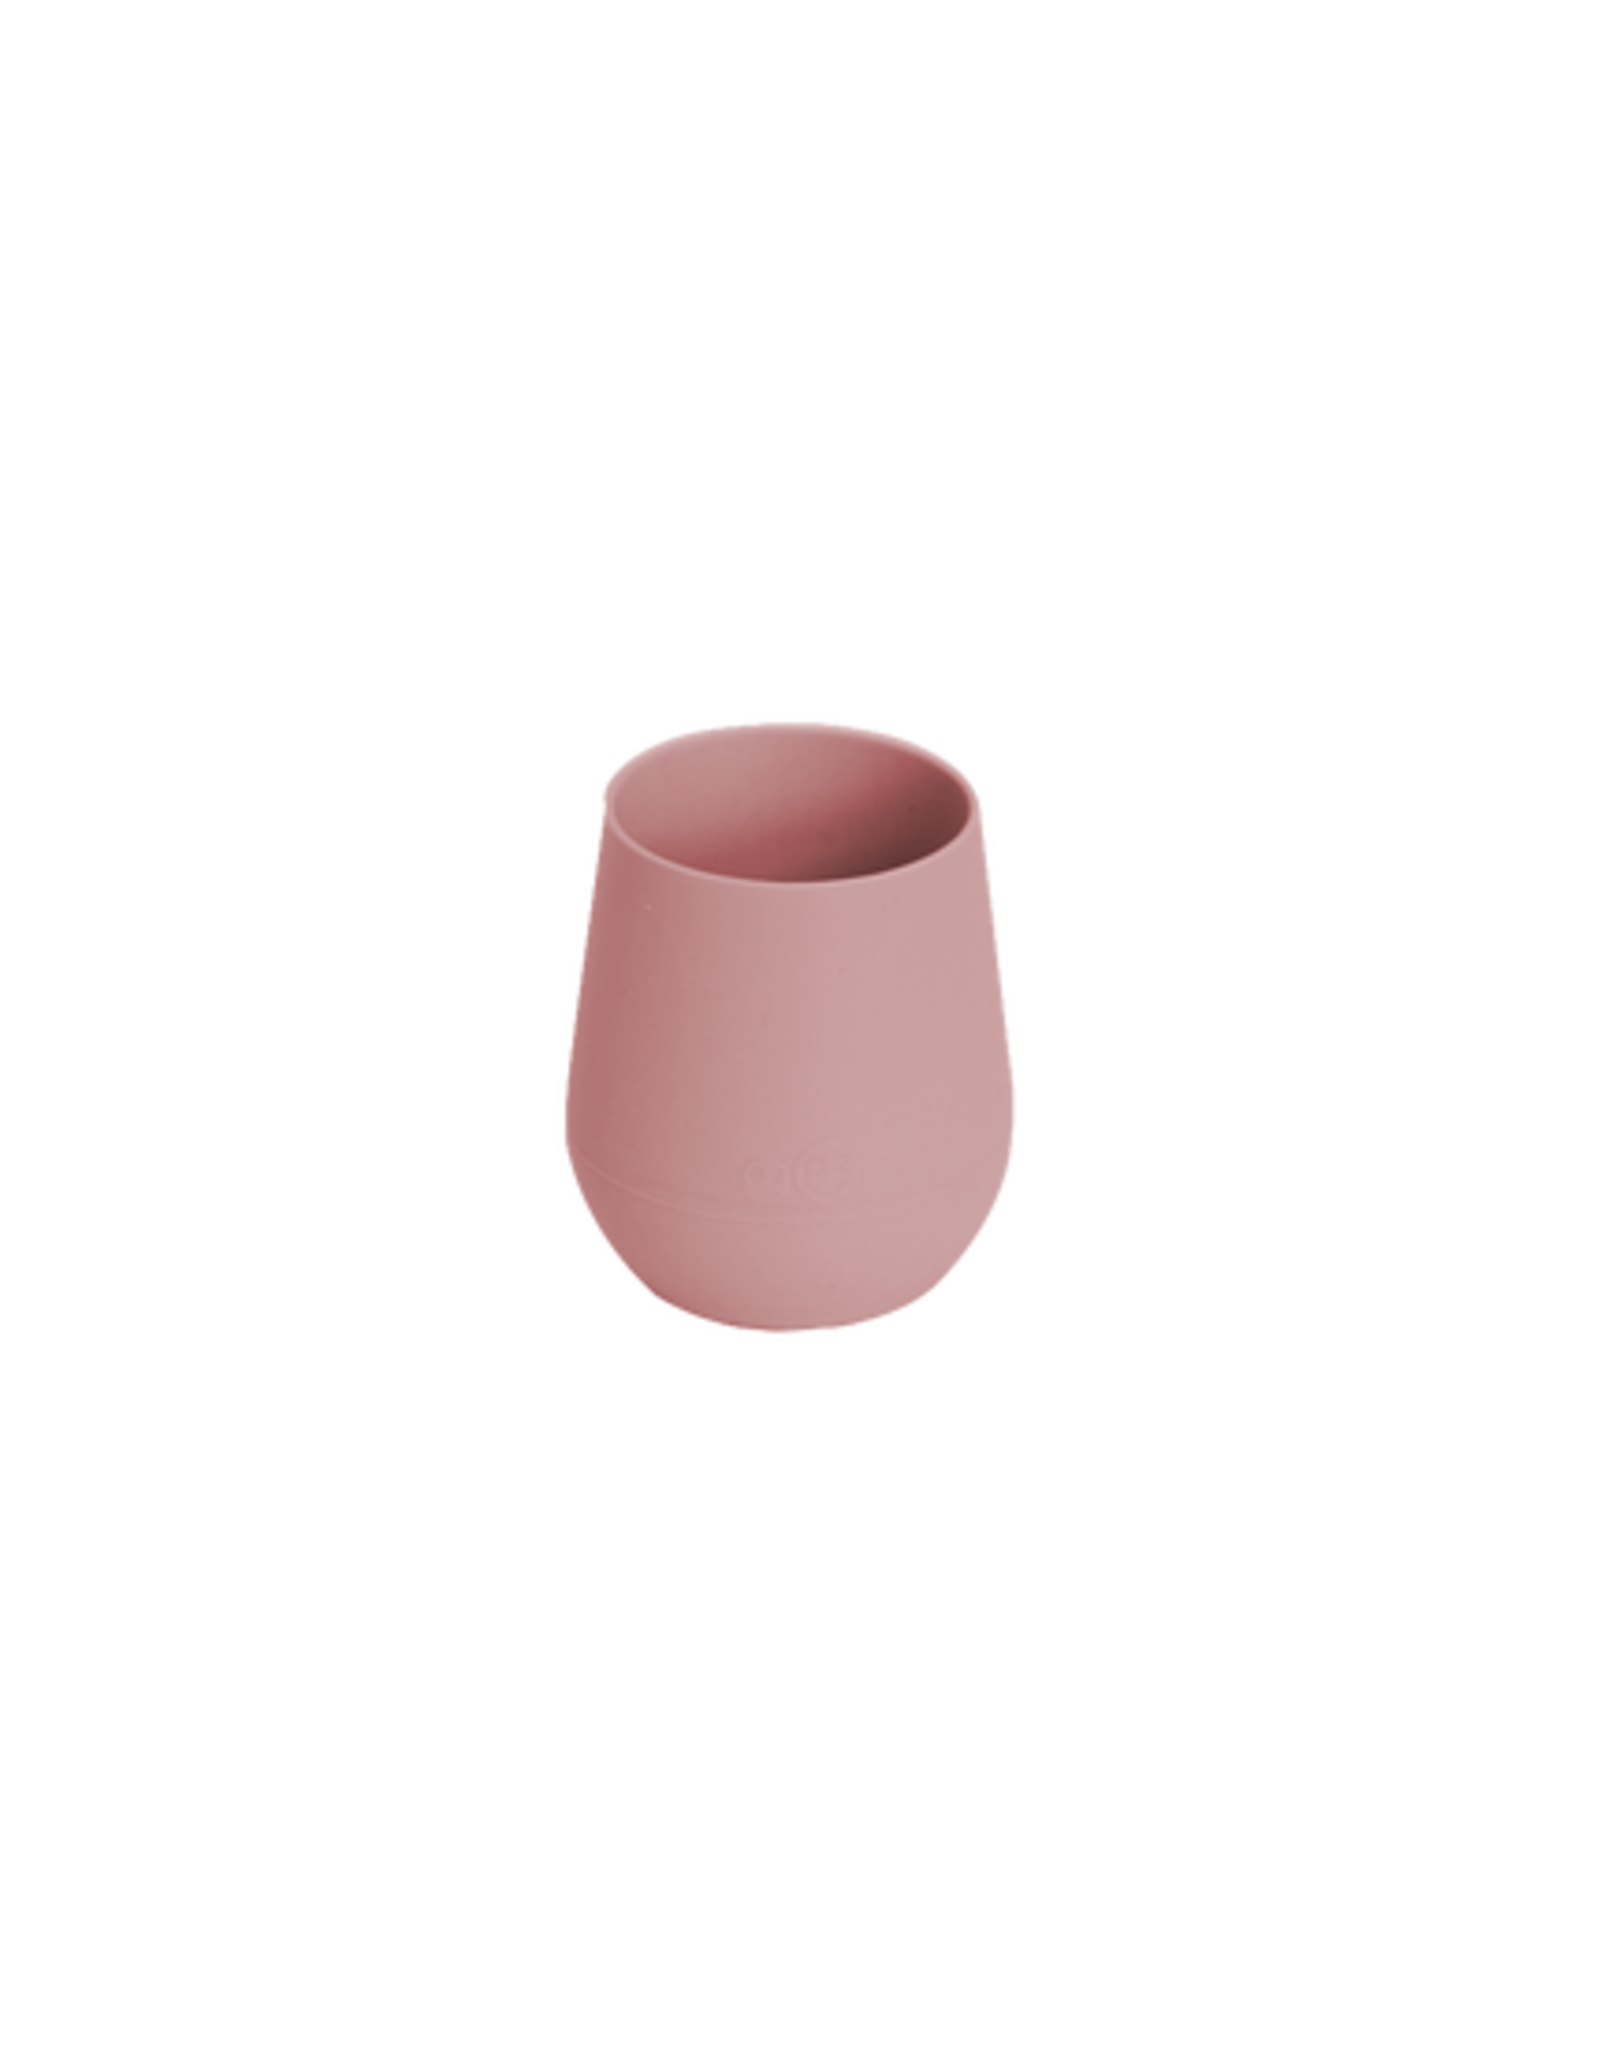 ezpz Tiny Cup - Blush